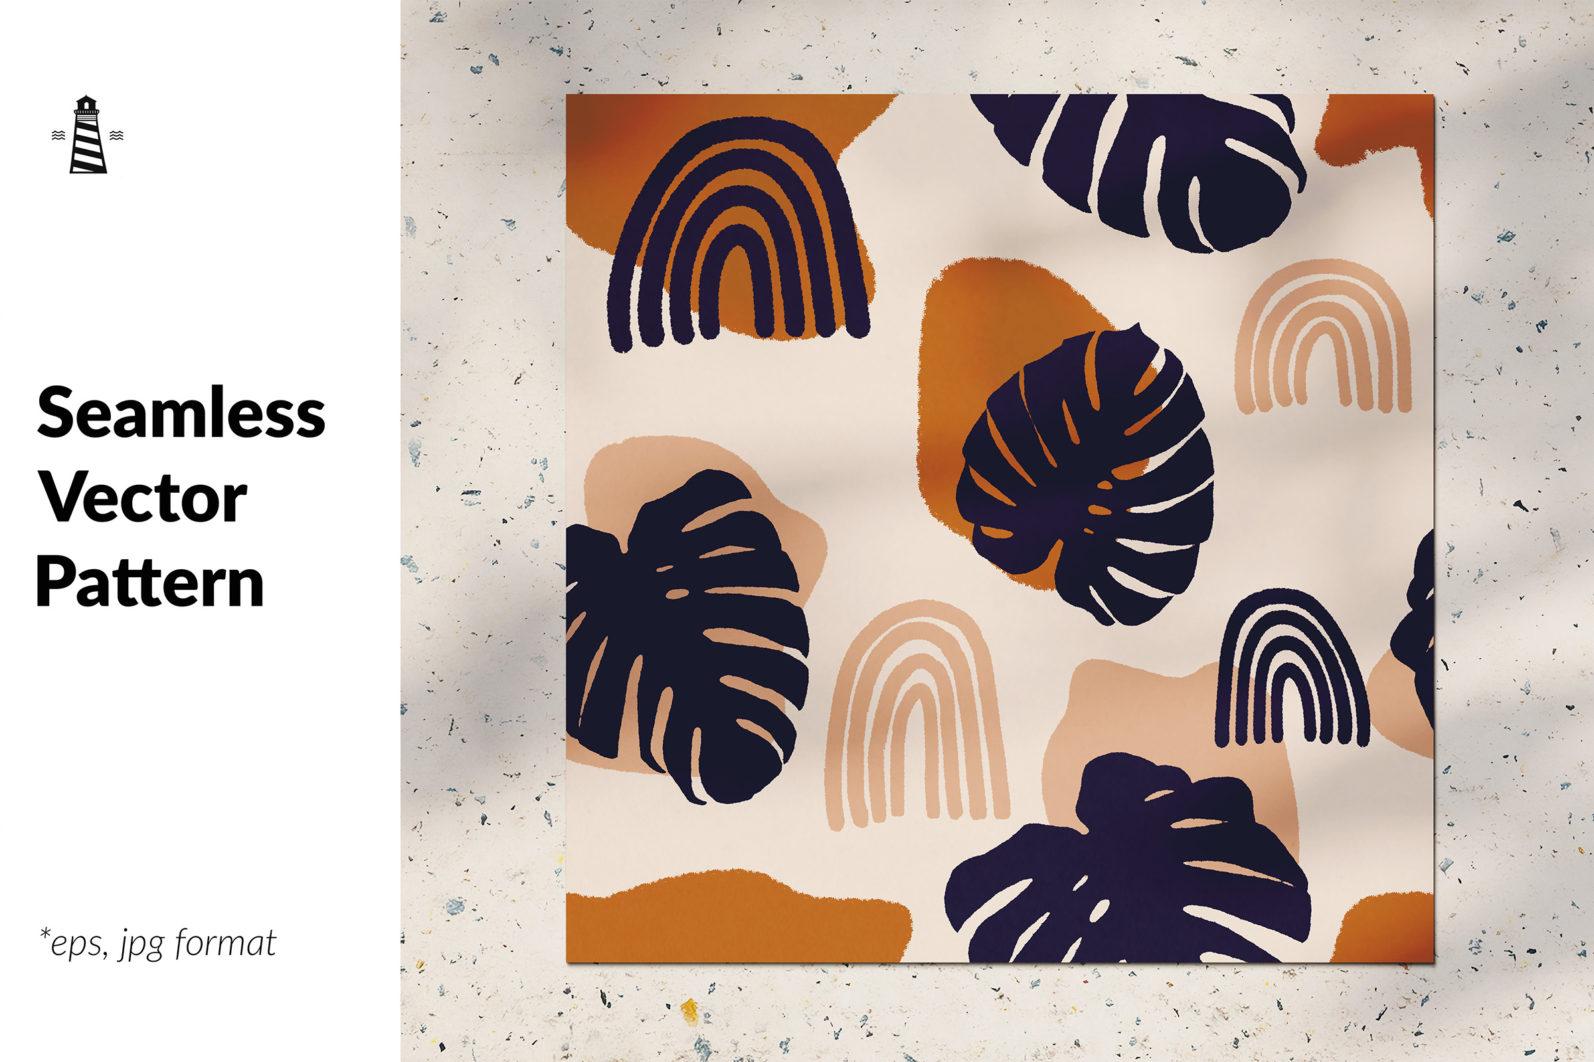 Palm leaves seamless pattern - CREATIVE MARKET 5 -